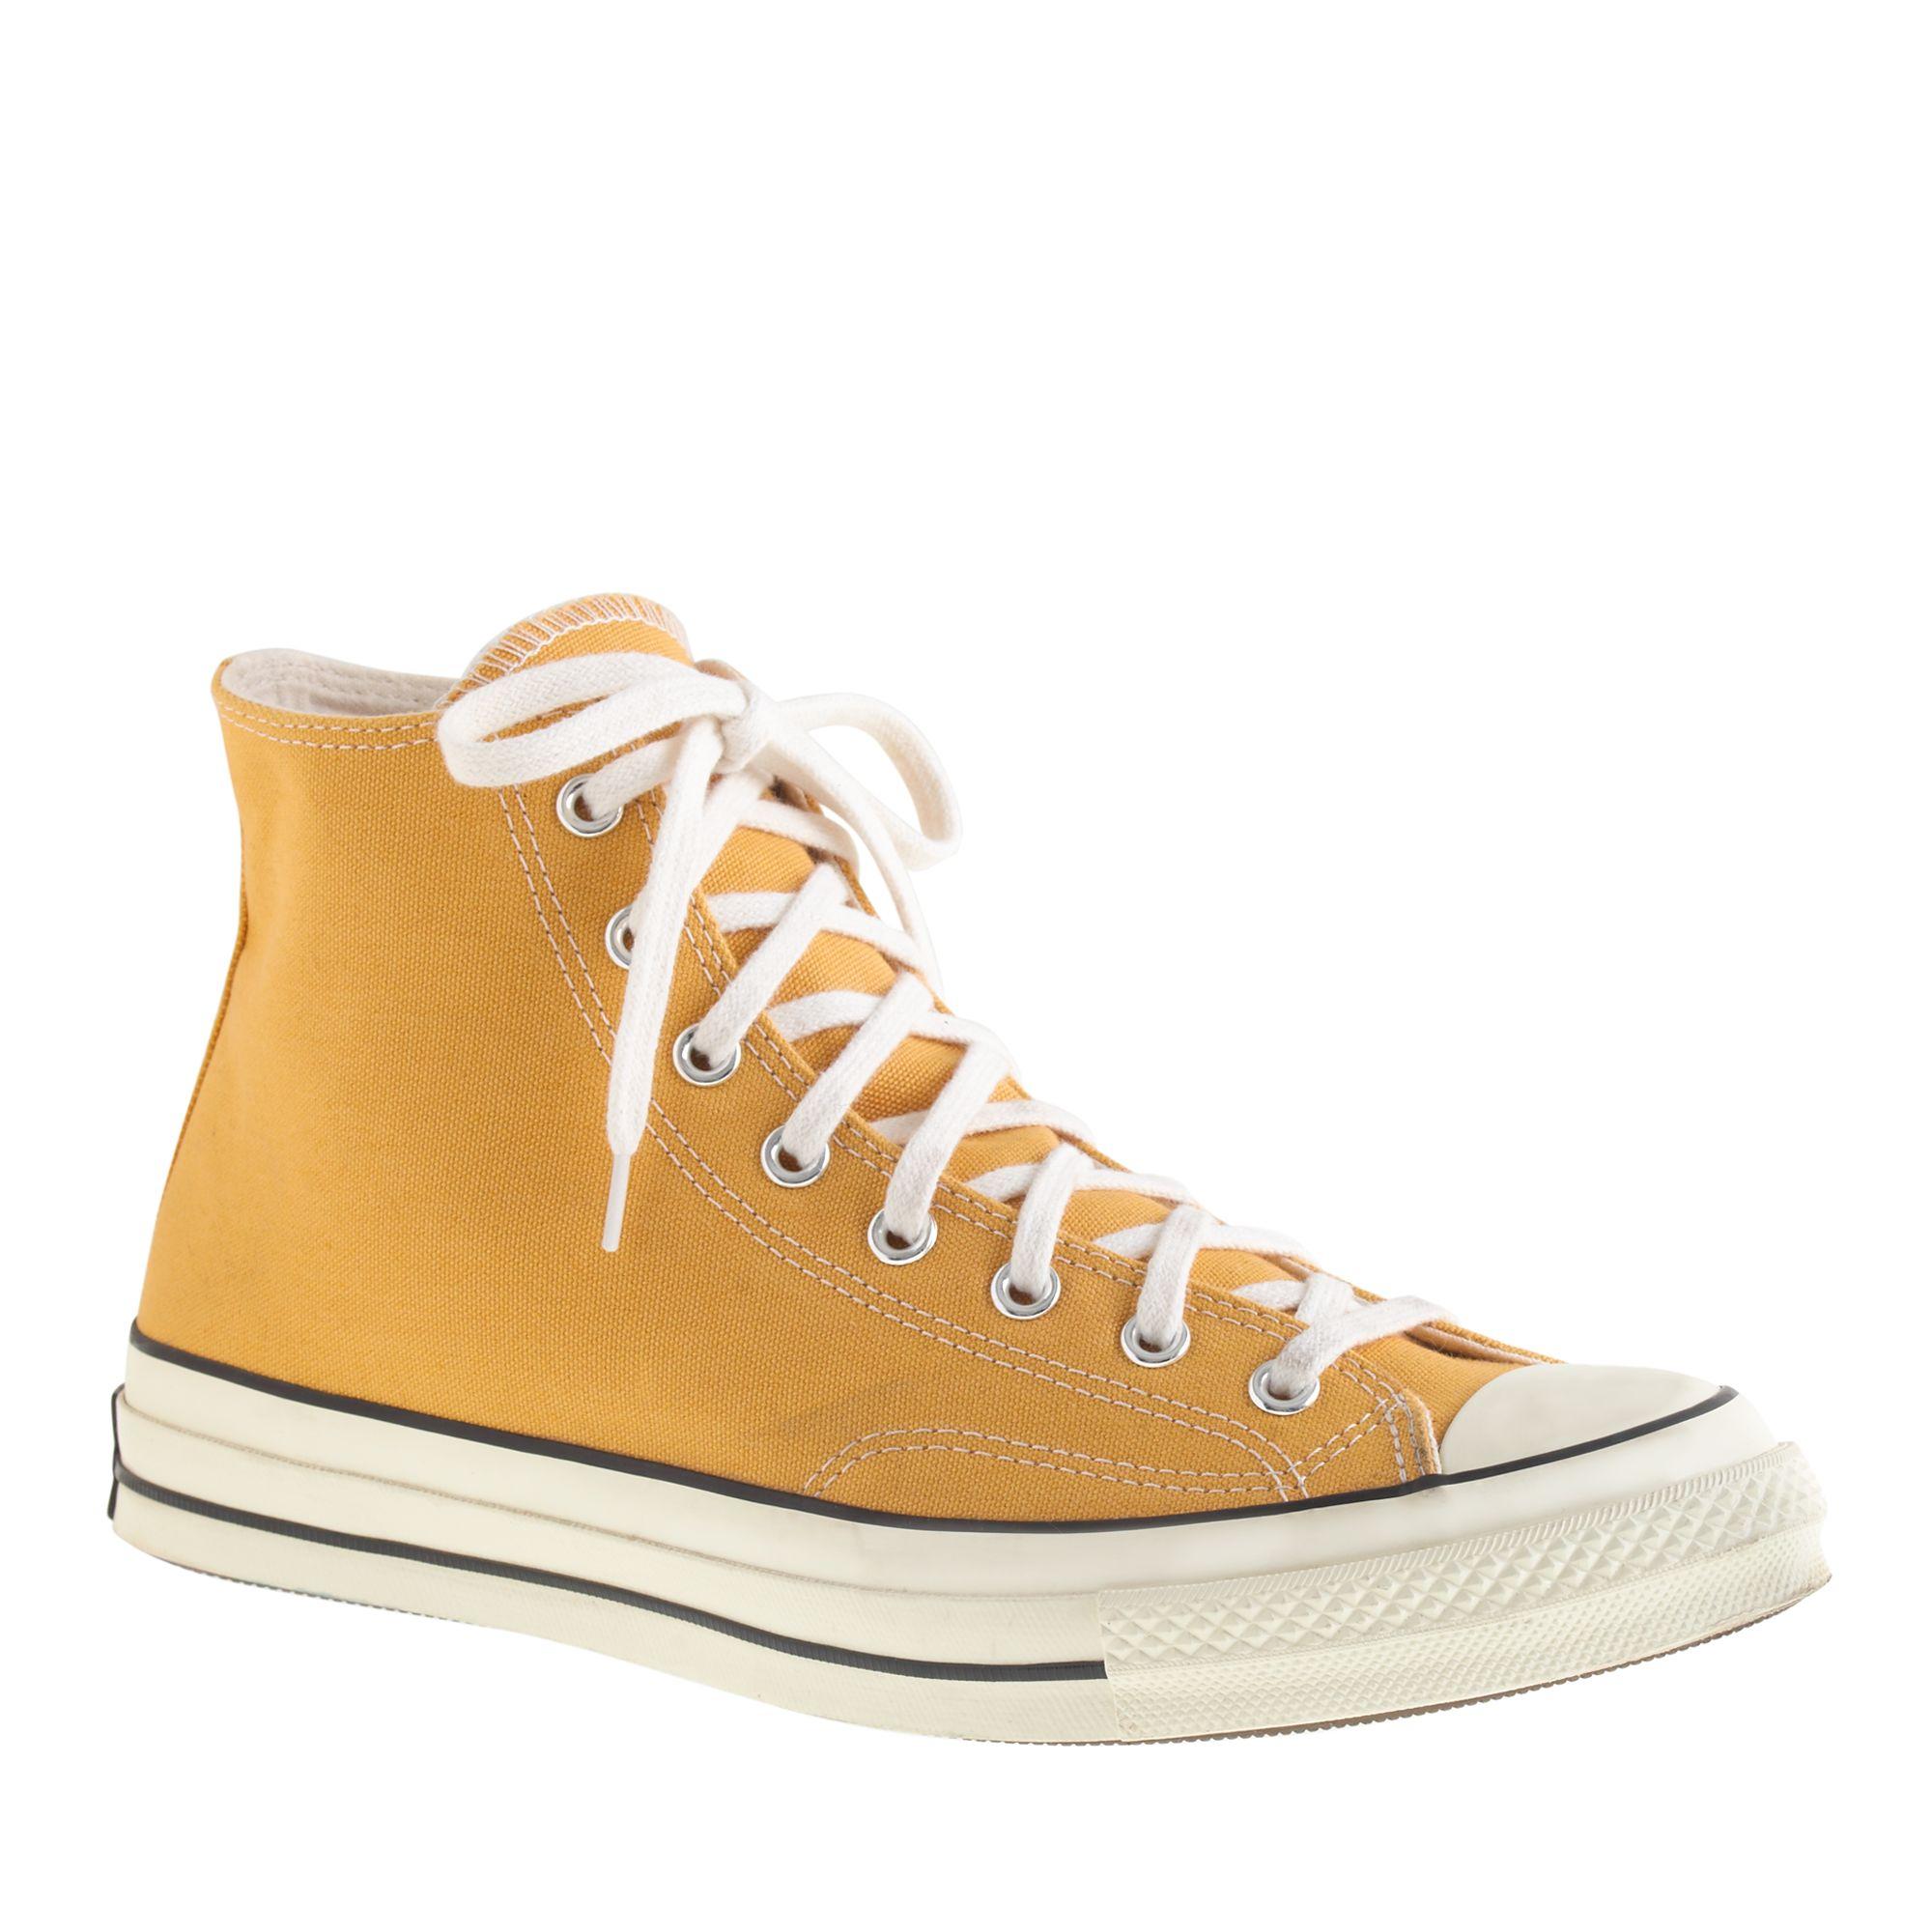 1cc2b77a866b19 J.Crew Converse Chuck Taylor All Star 70 Hightop Sneakers in Yellow ...